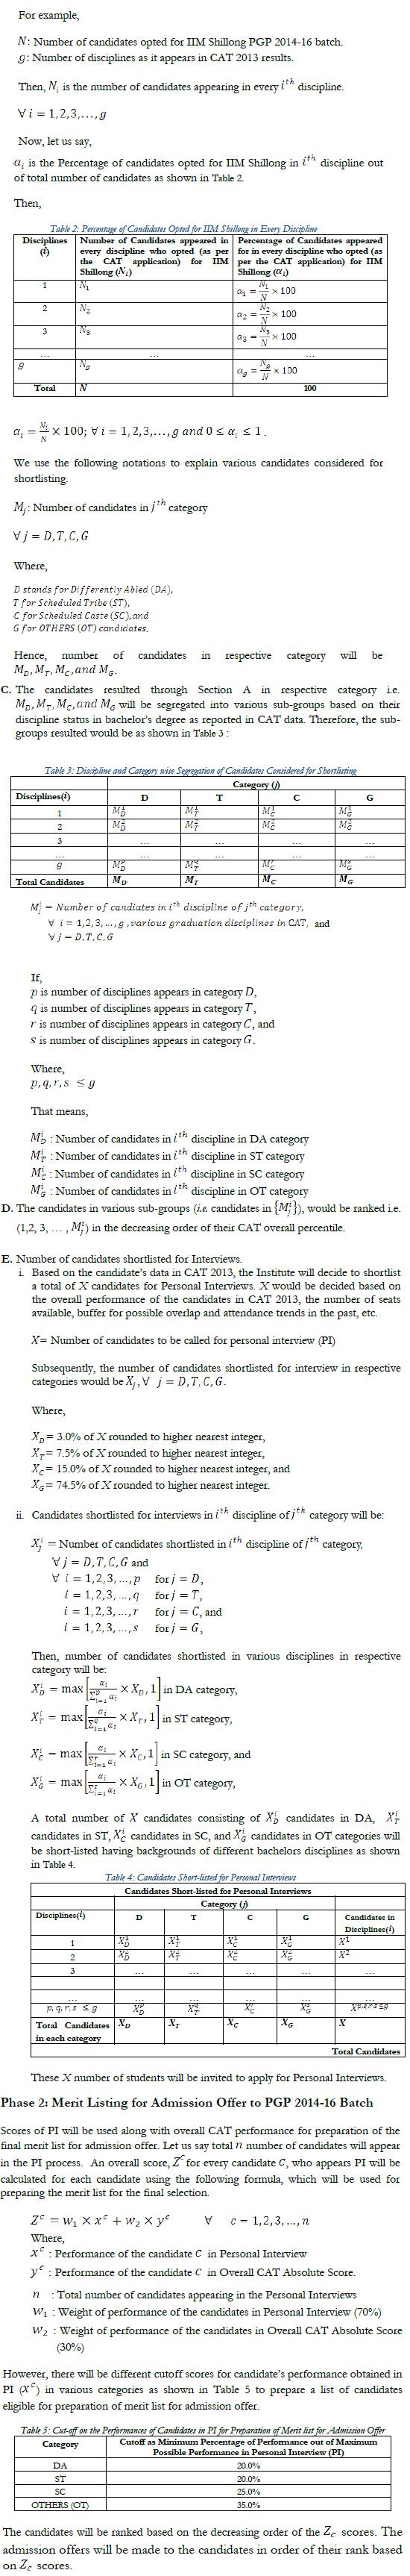 IIM Shillong Admission Criteria 2014   iims  Image